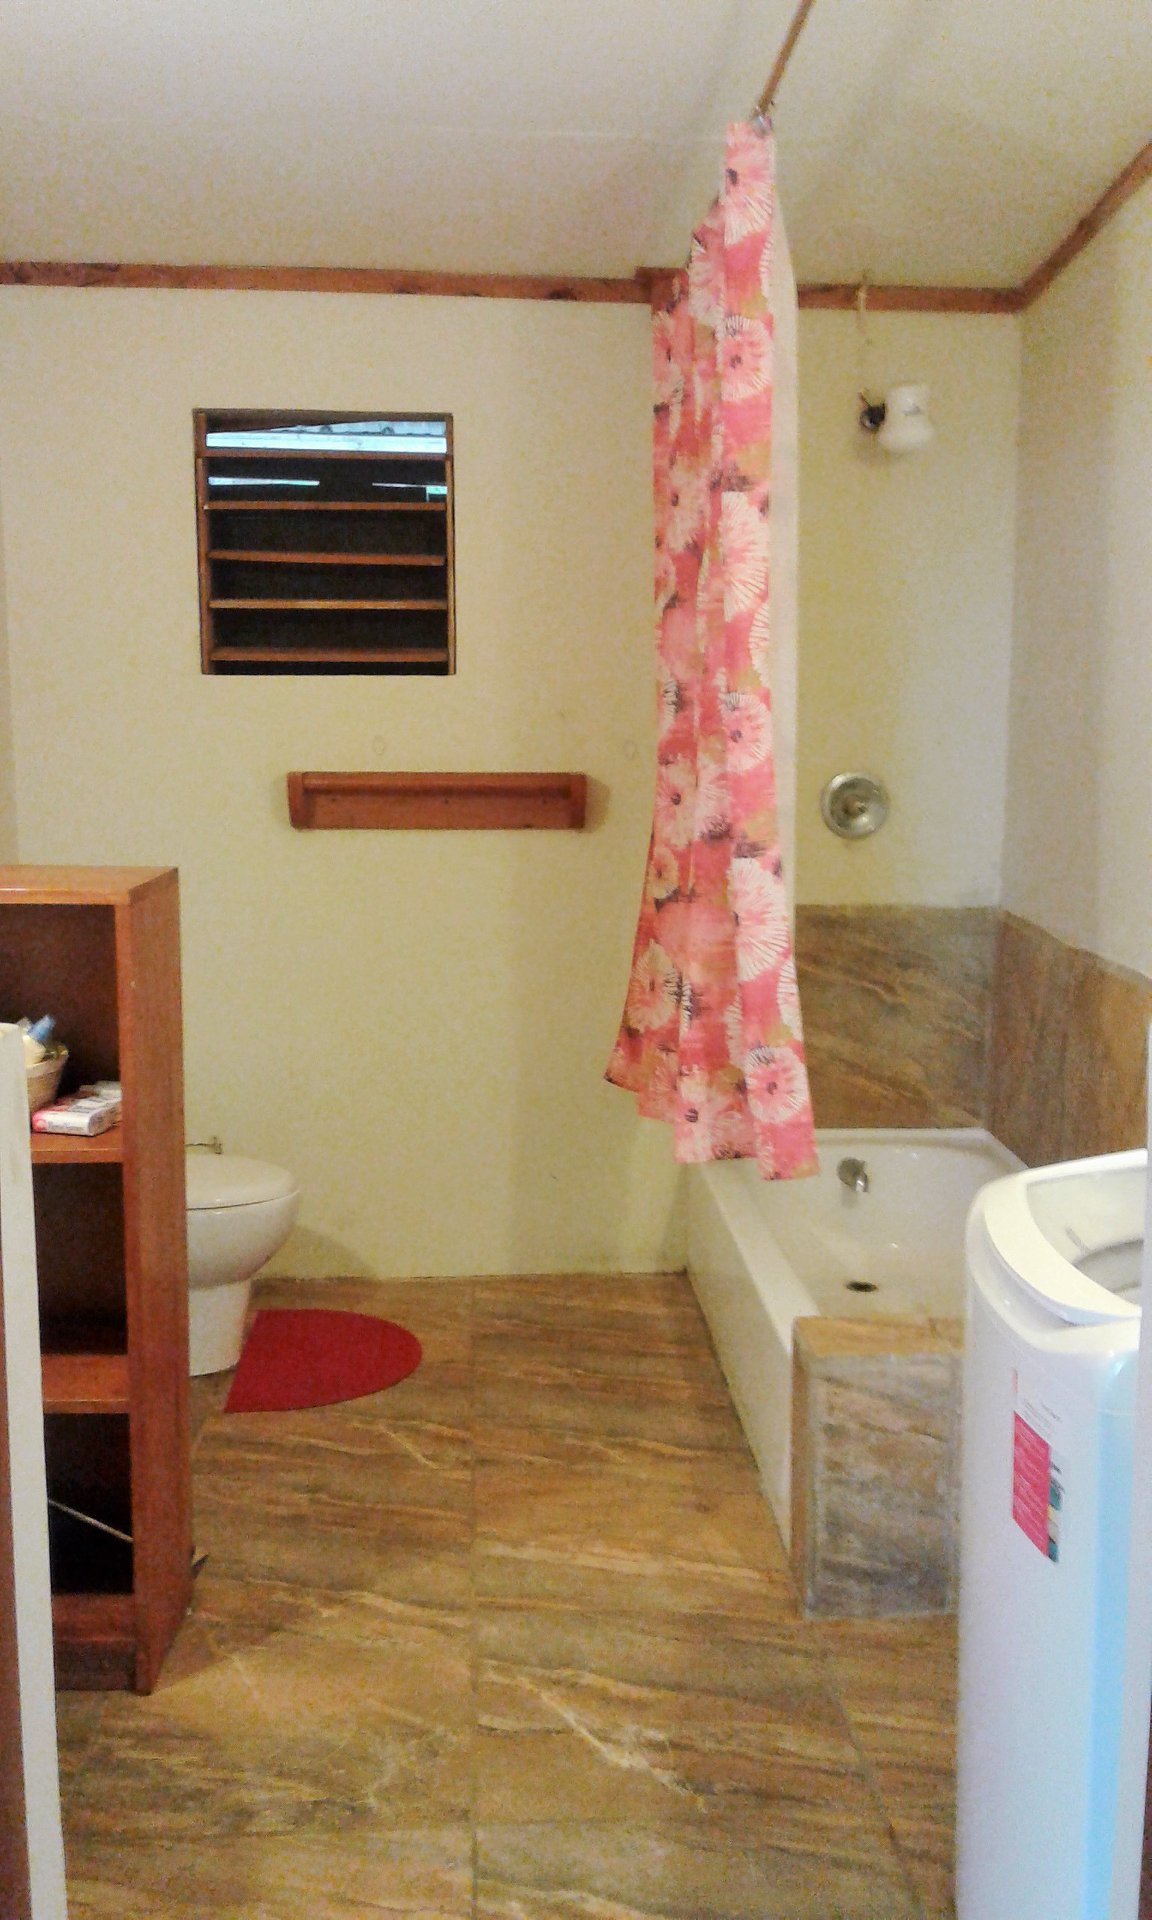 Mopan River House 1 Bed 1 bath